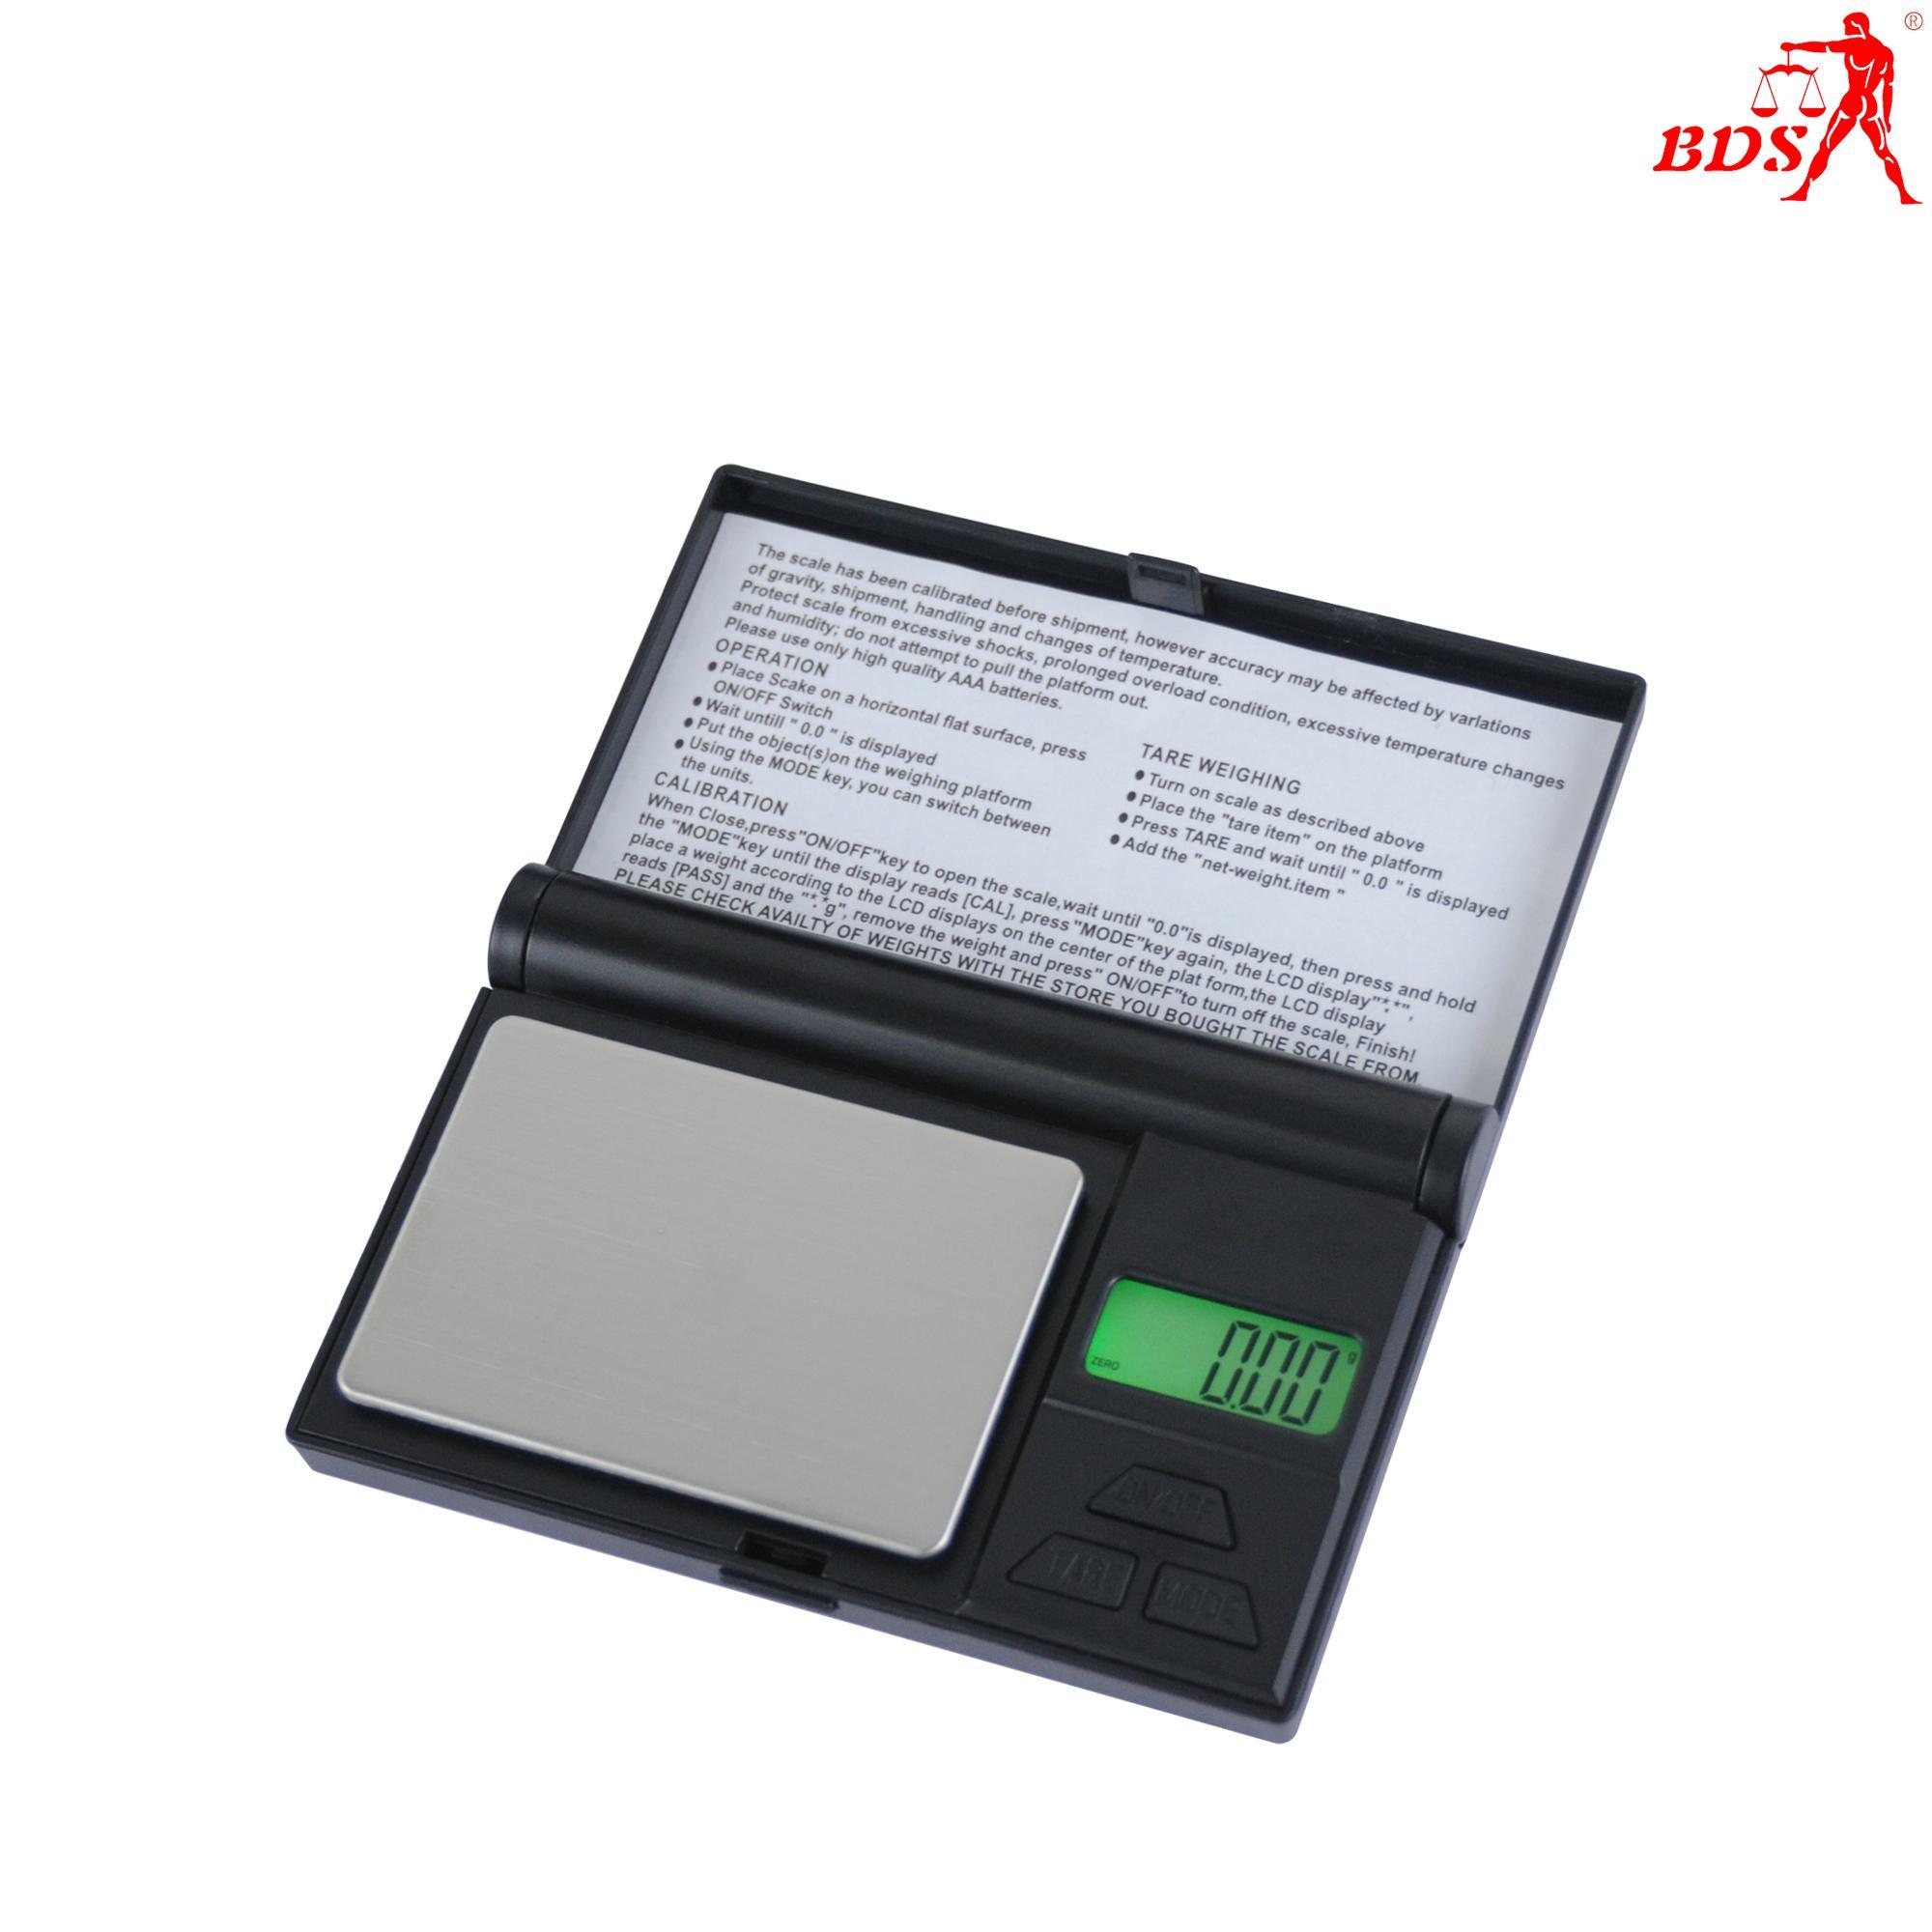 BDS 北斗星 口袋秤 珠寶秤 便攜電子秤 電子秤500g生產廠家 4